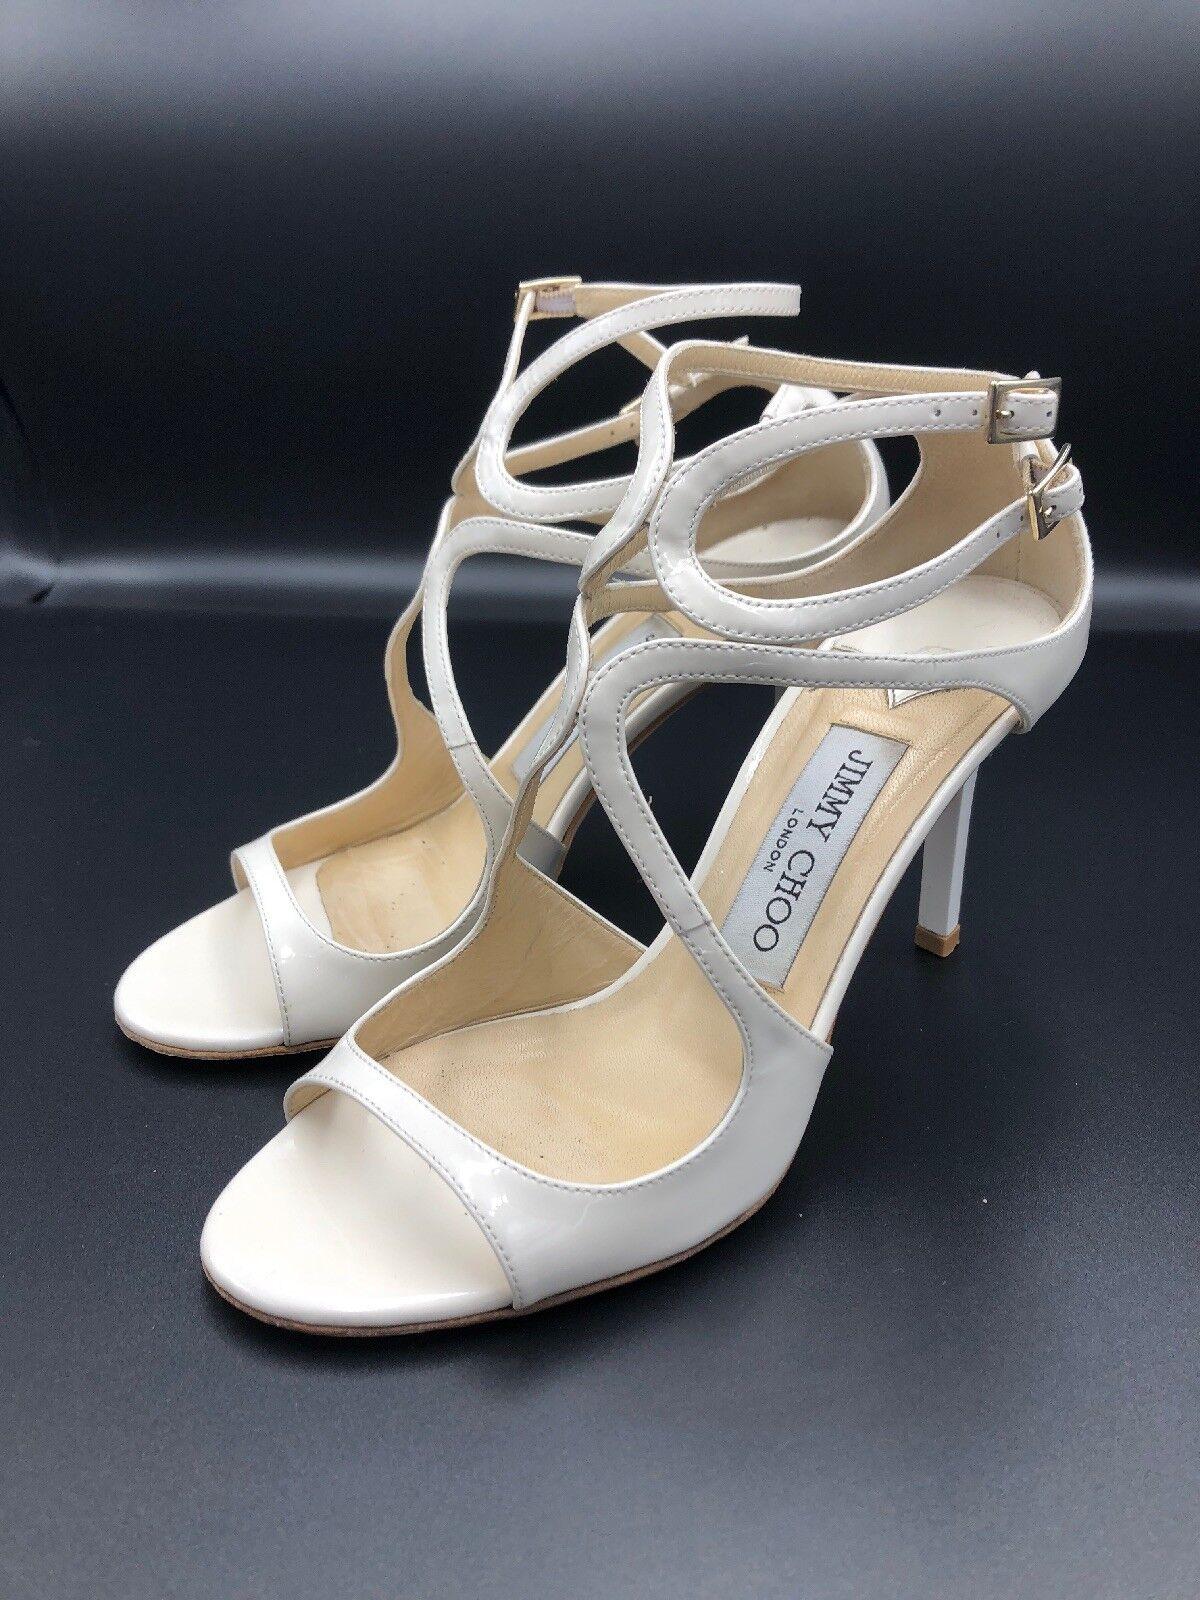 JIMMY CHOO 'ivette' Chalk Weiß Patent Strappy Heels Sandals Größe UK 2 Eu 35